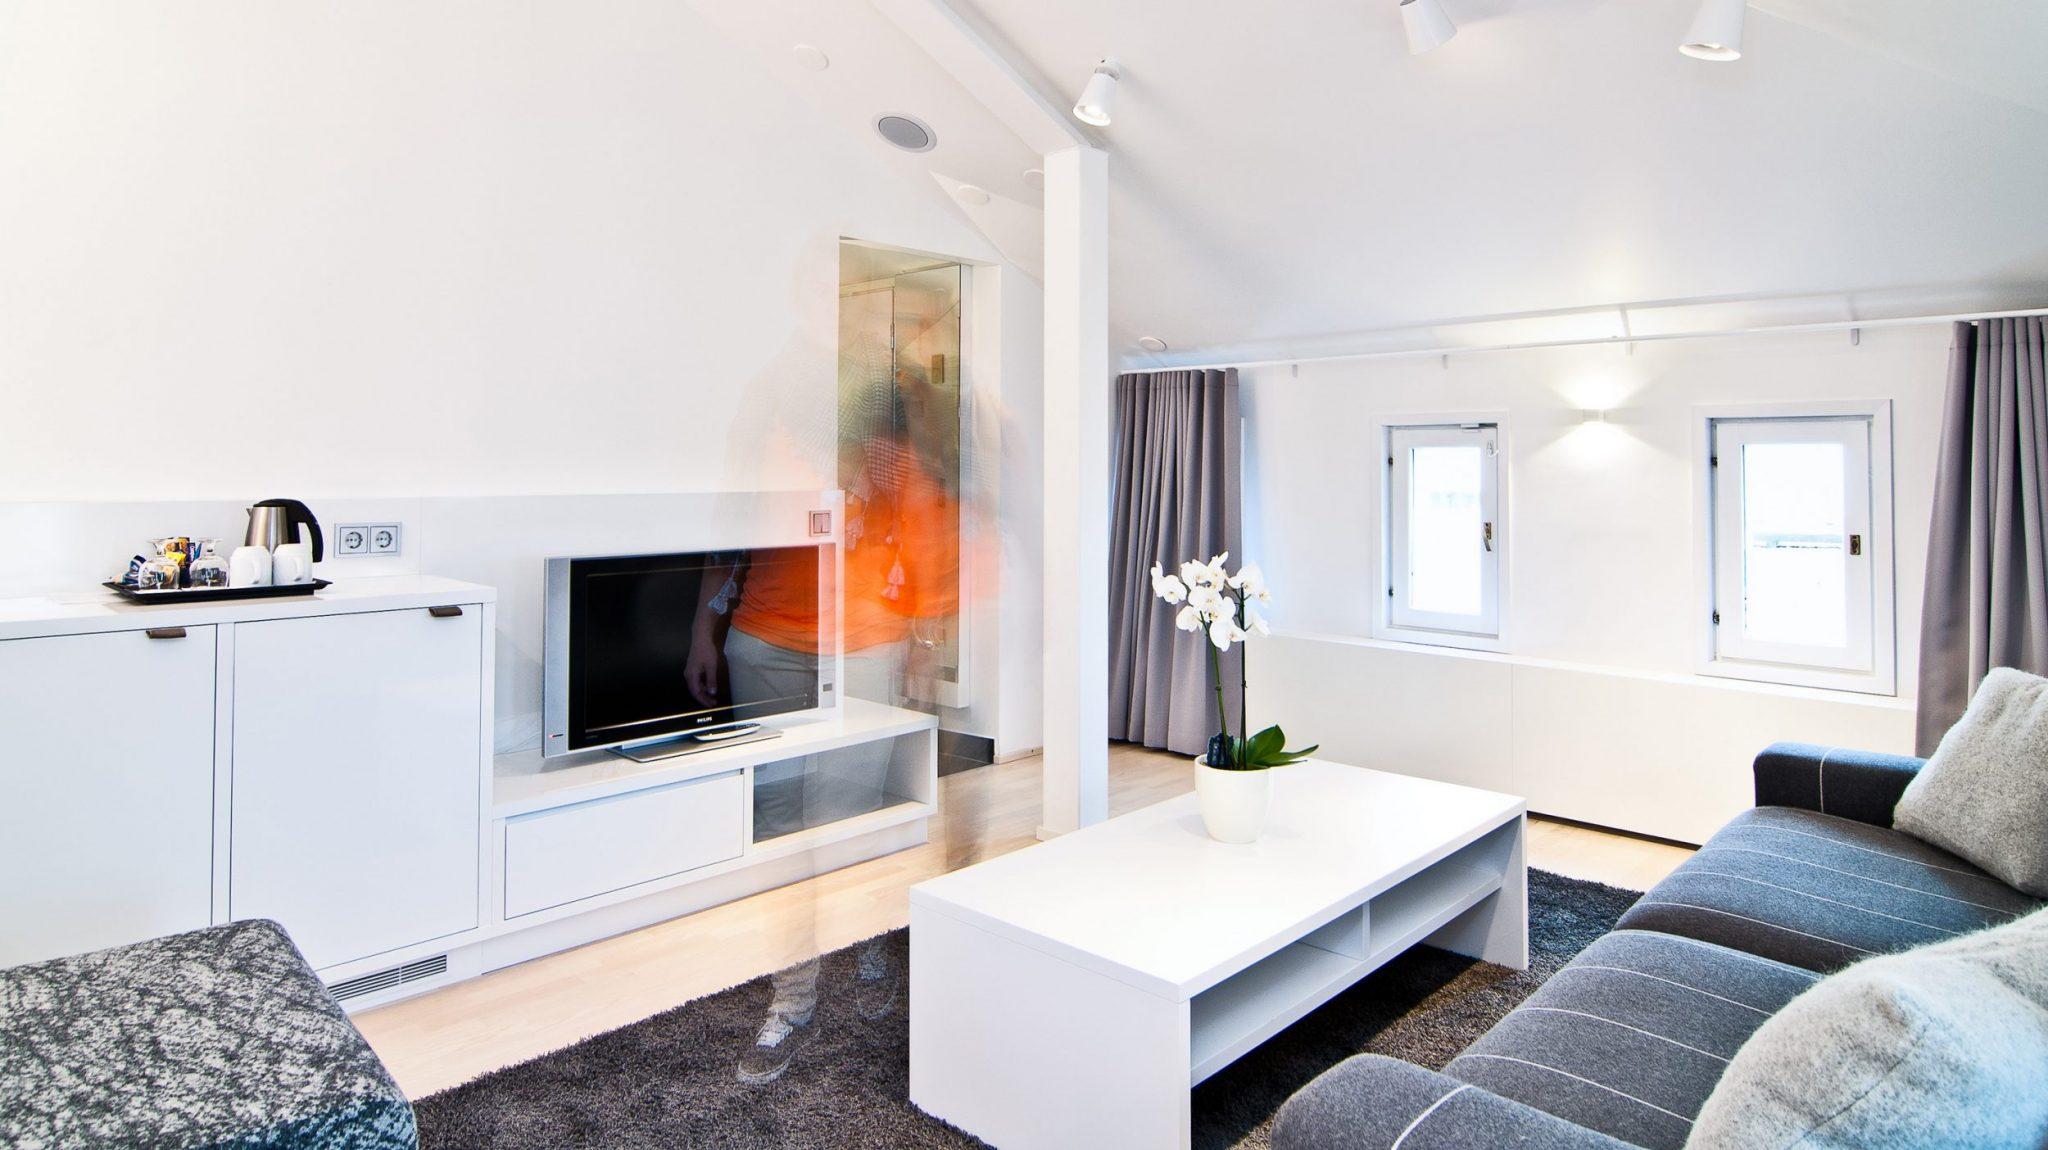 Sokos_Hotel_Villa_Tampere_GI_project-3